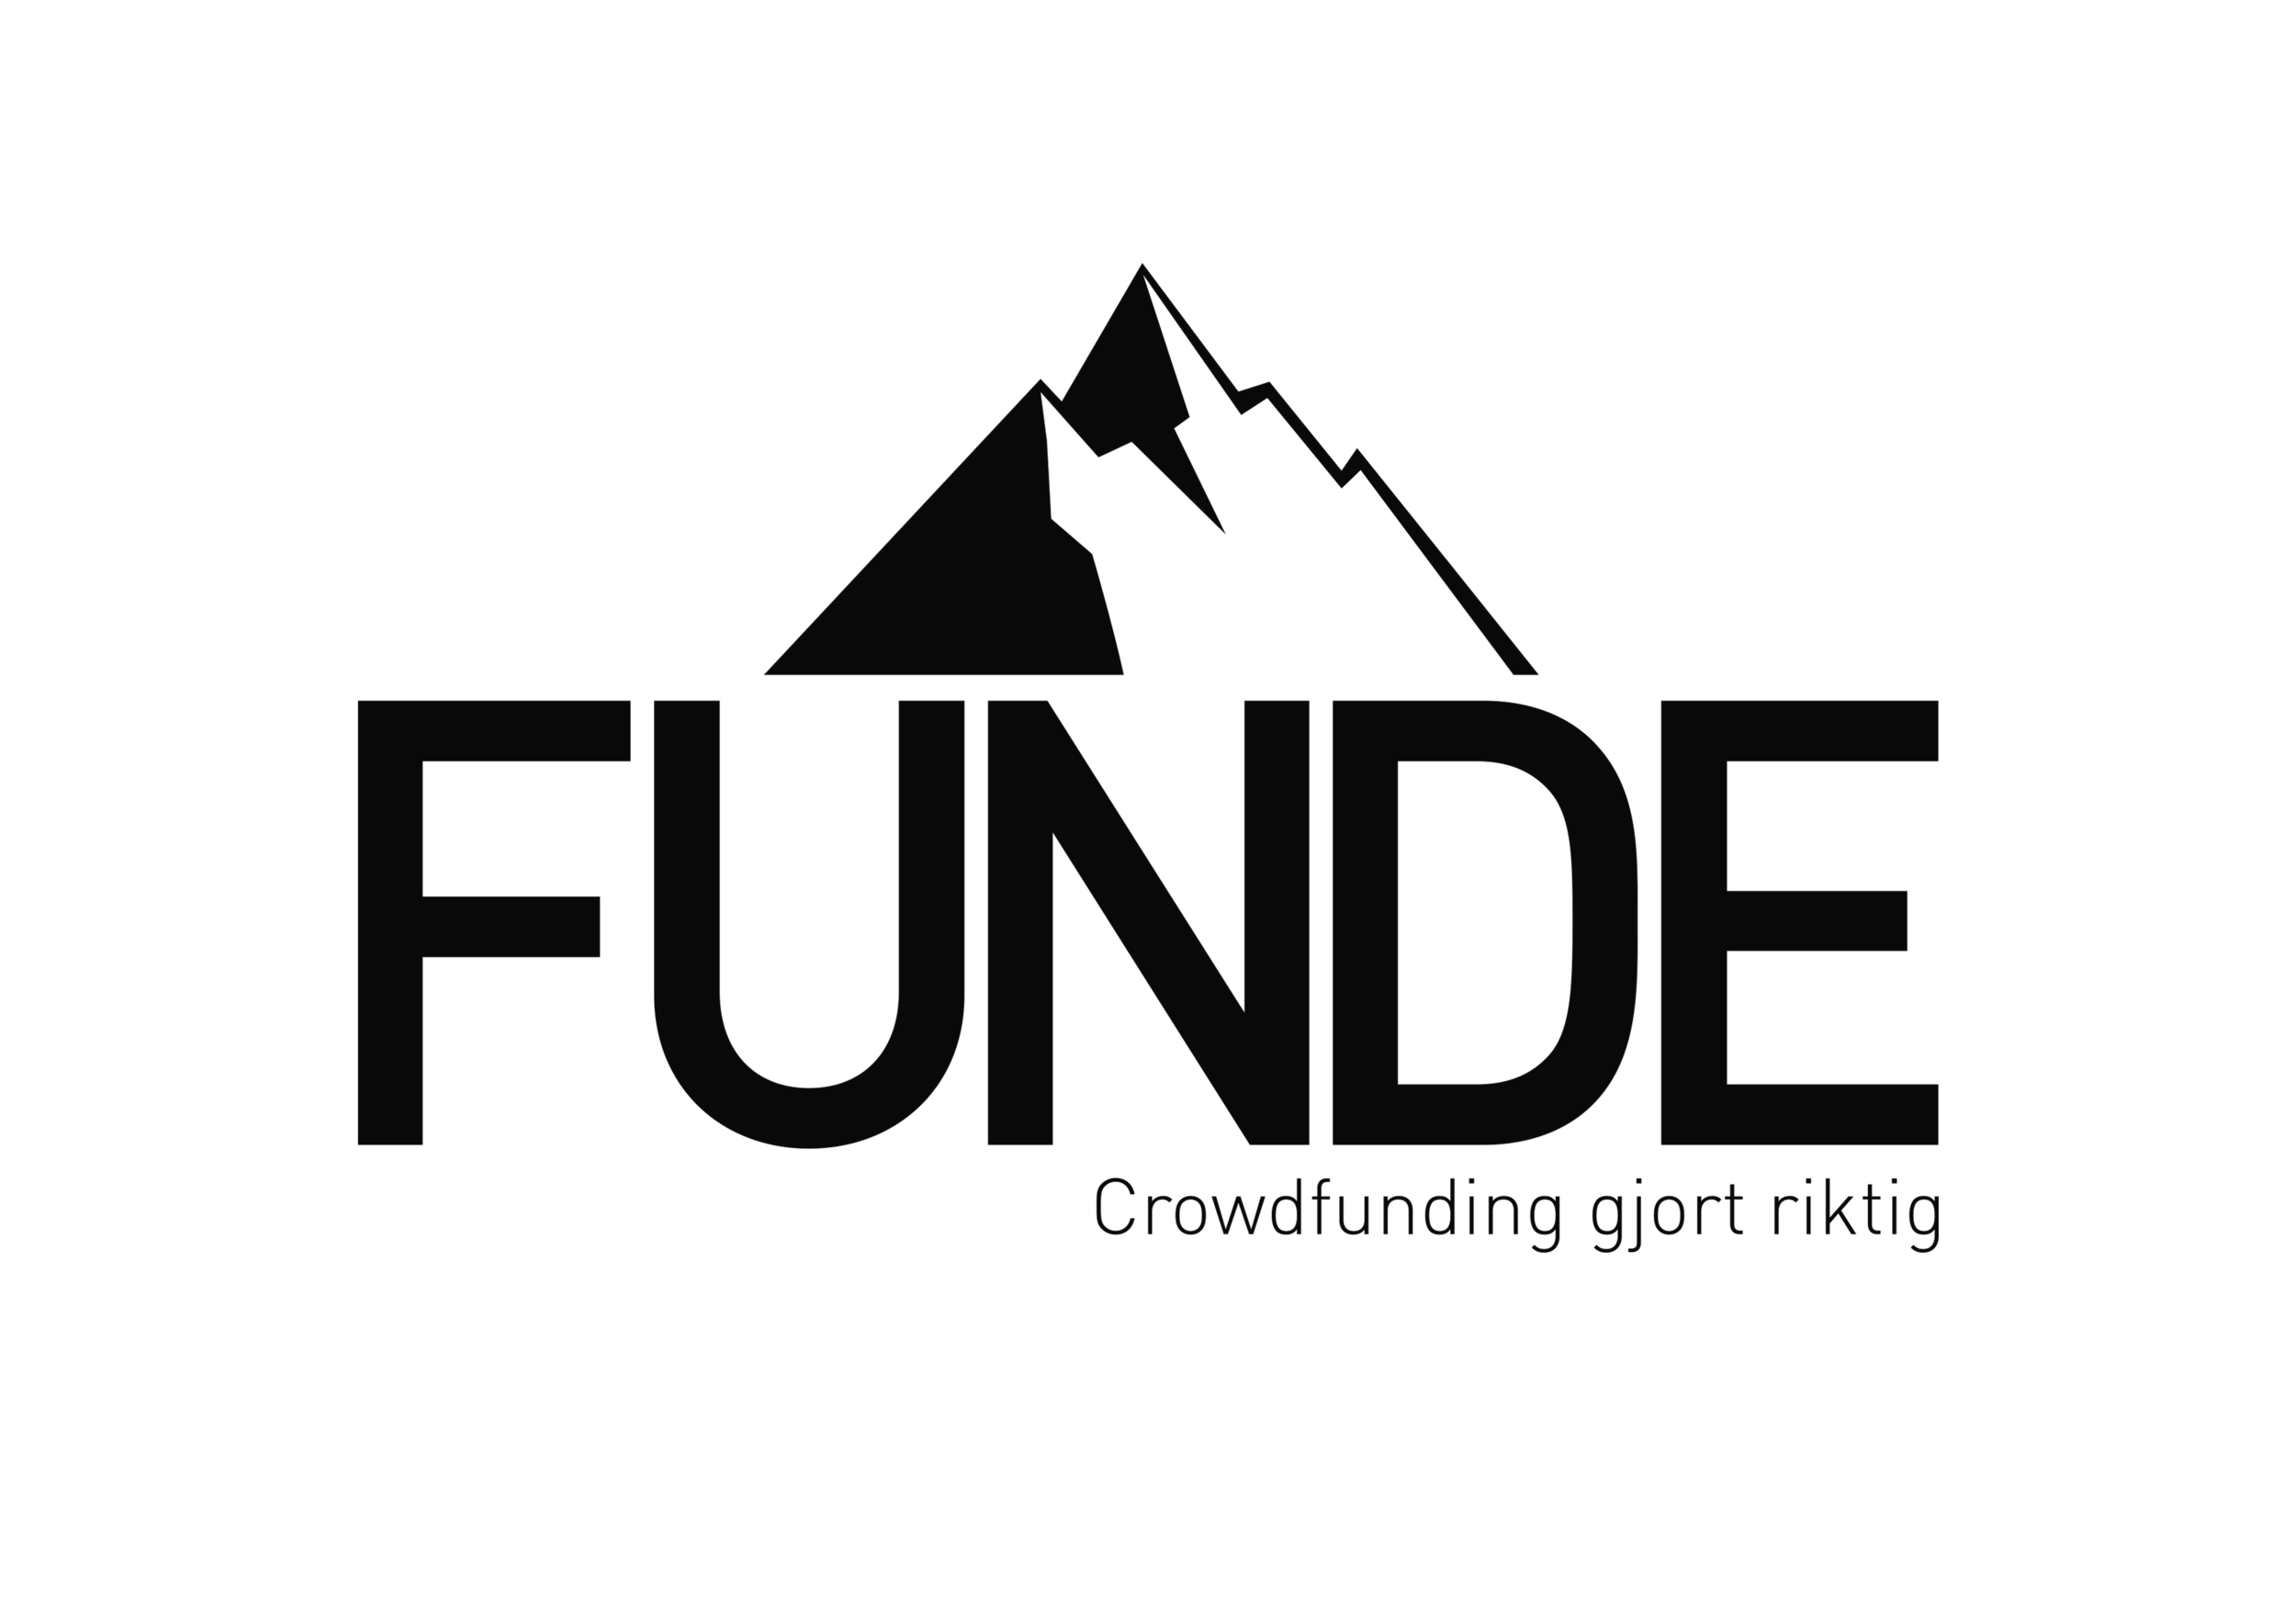 Final logo-1.png